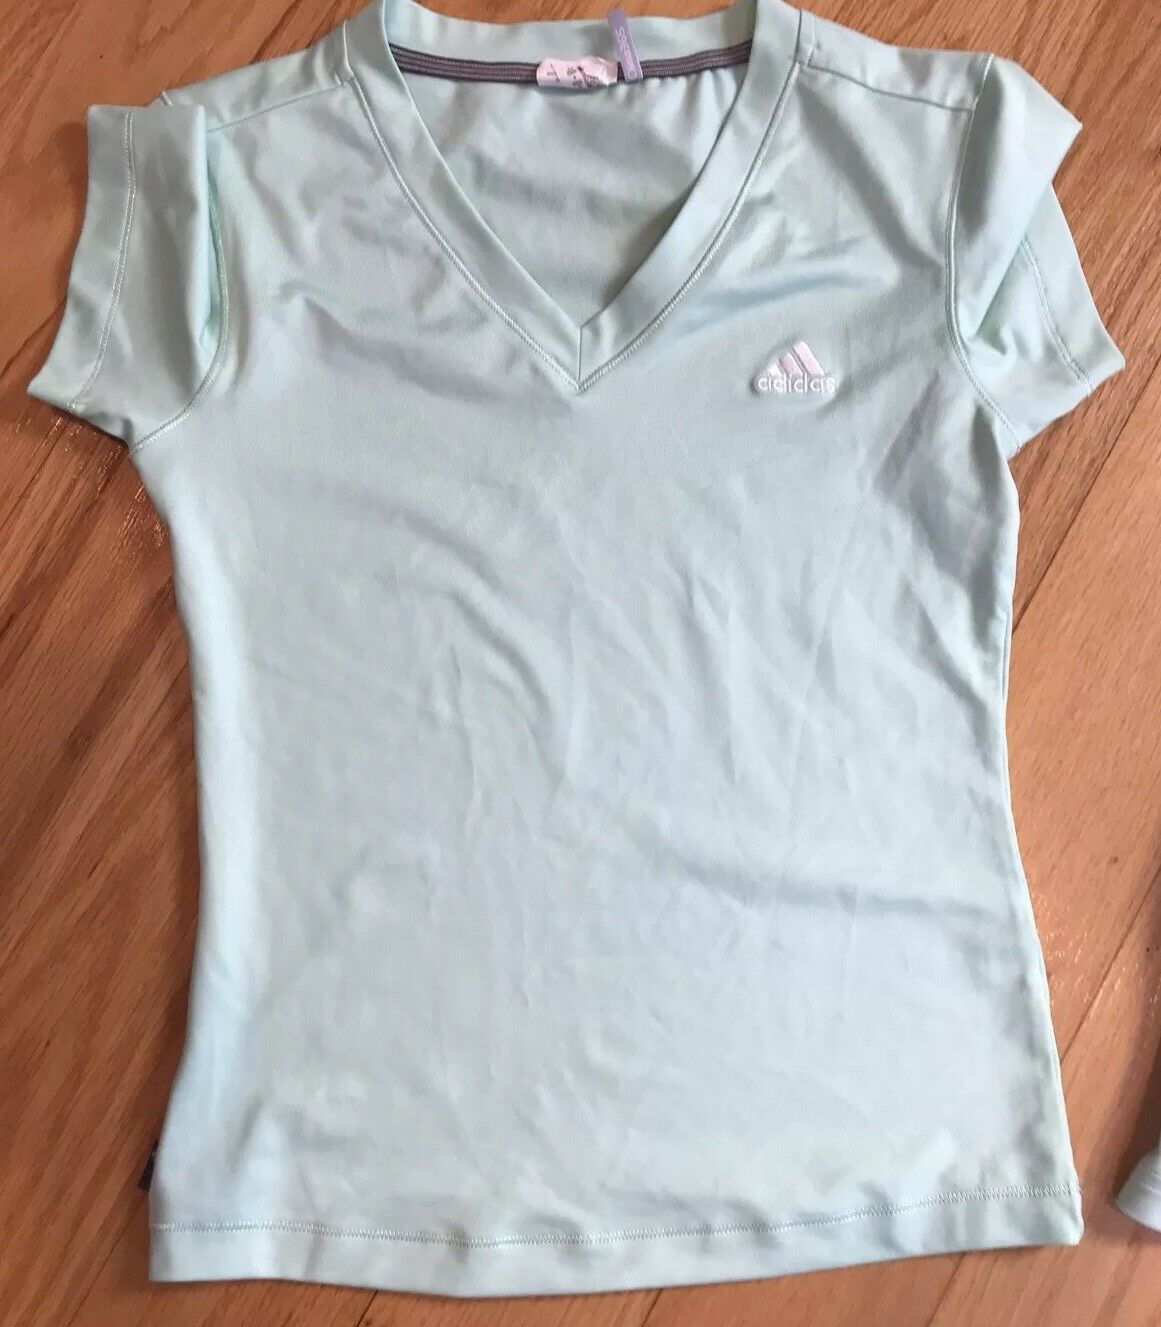 Adidas Mint Athletic Shirt Womens And Clima365 LongSleeve Green Mint